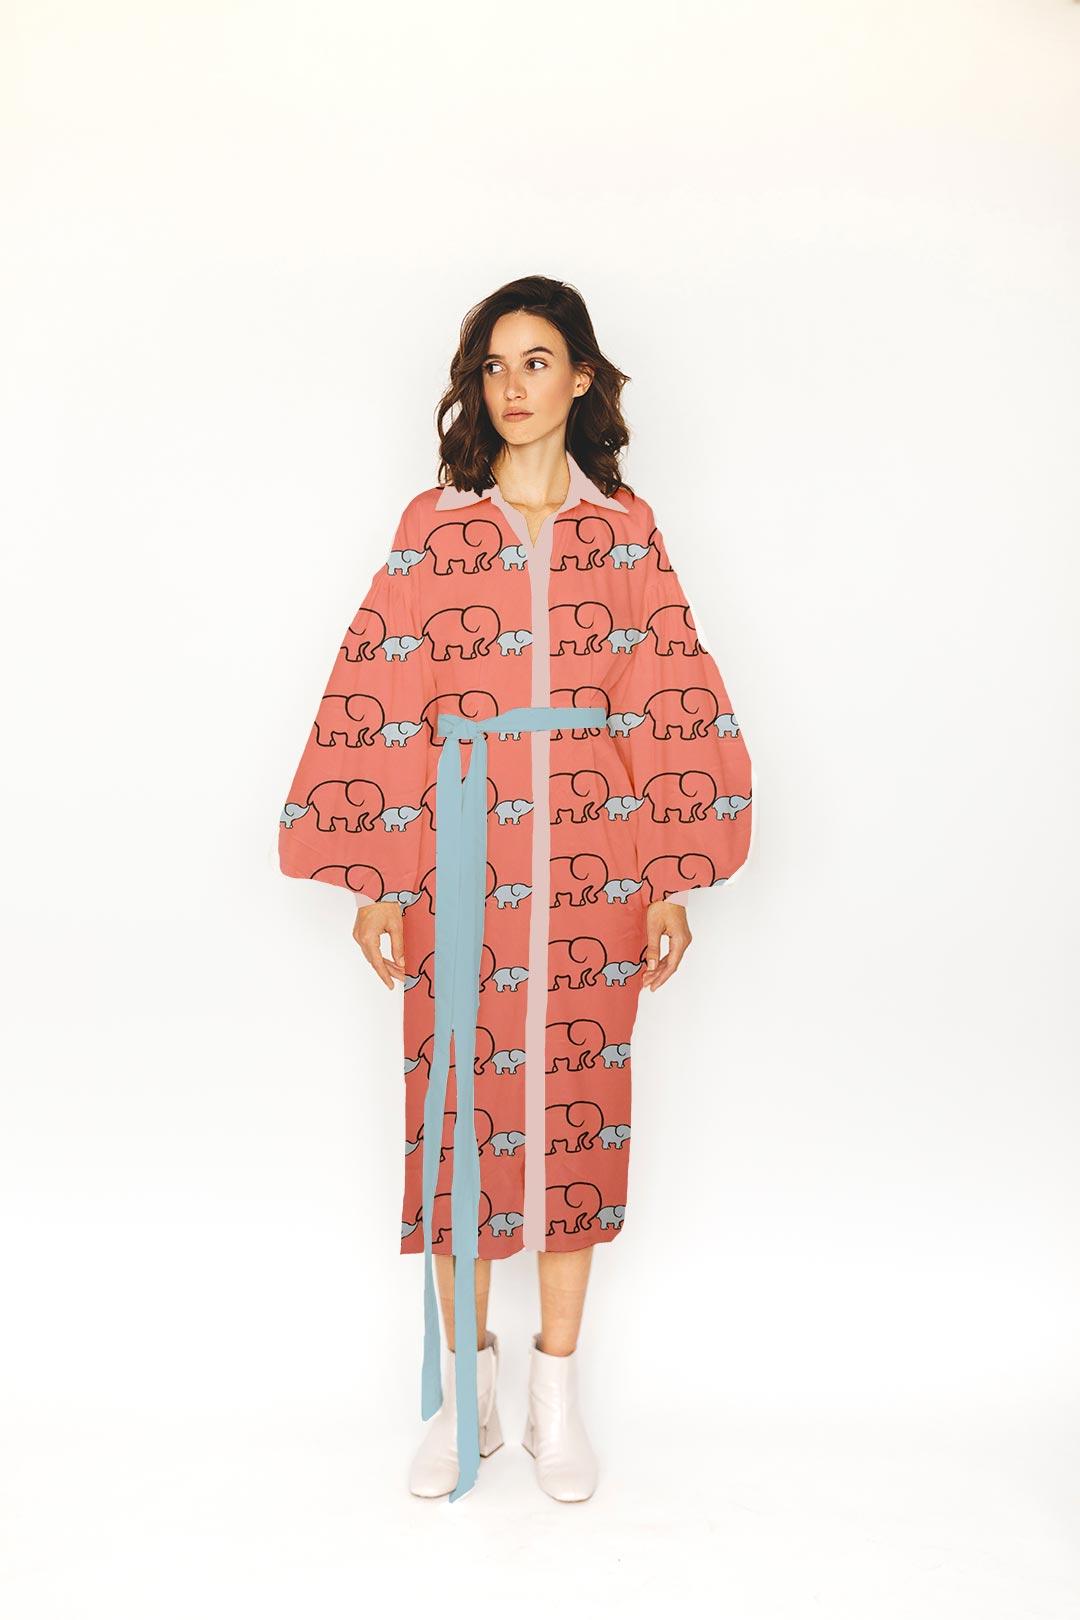 Cotton Shirt Dress – Bade Miya, Chote Miya